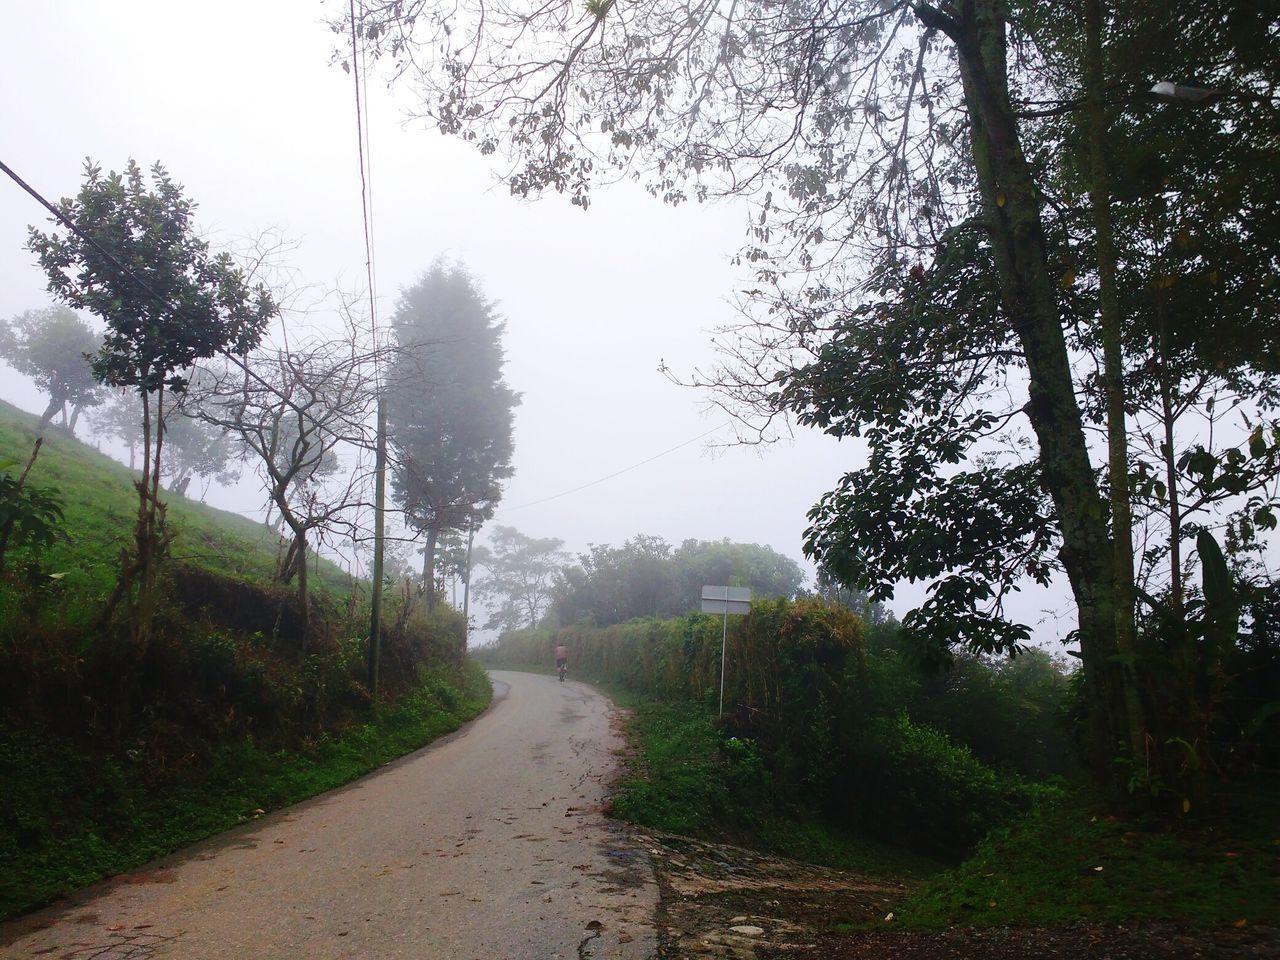 Morning Fog Nature Rainy Season Outdoors Wet Road Bike Ride